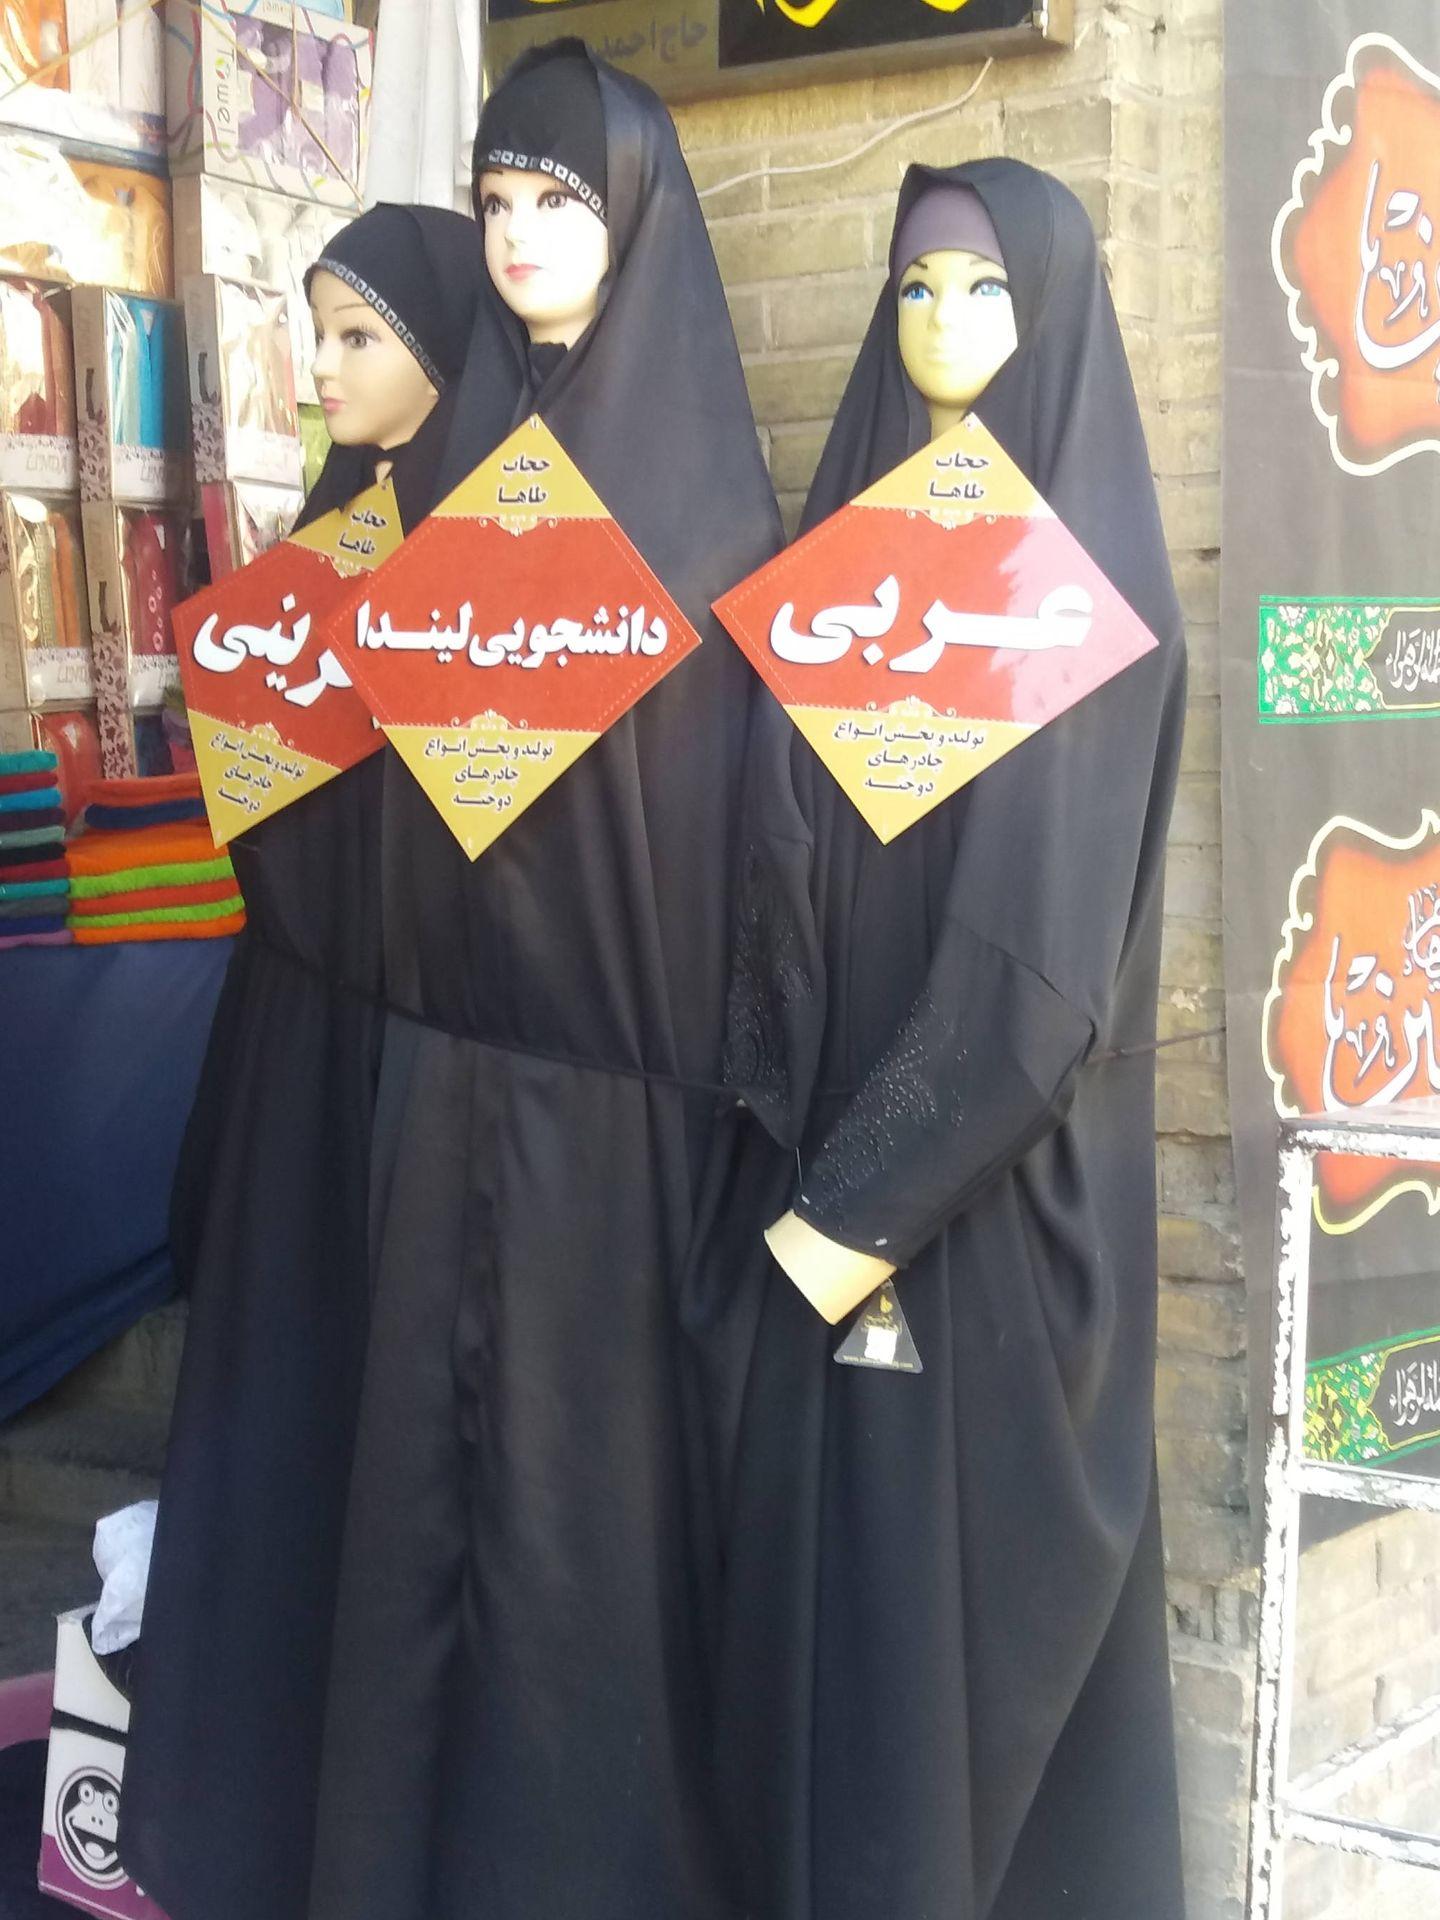 Moda femenina iraní.